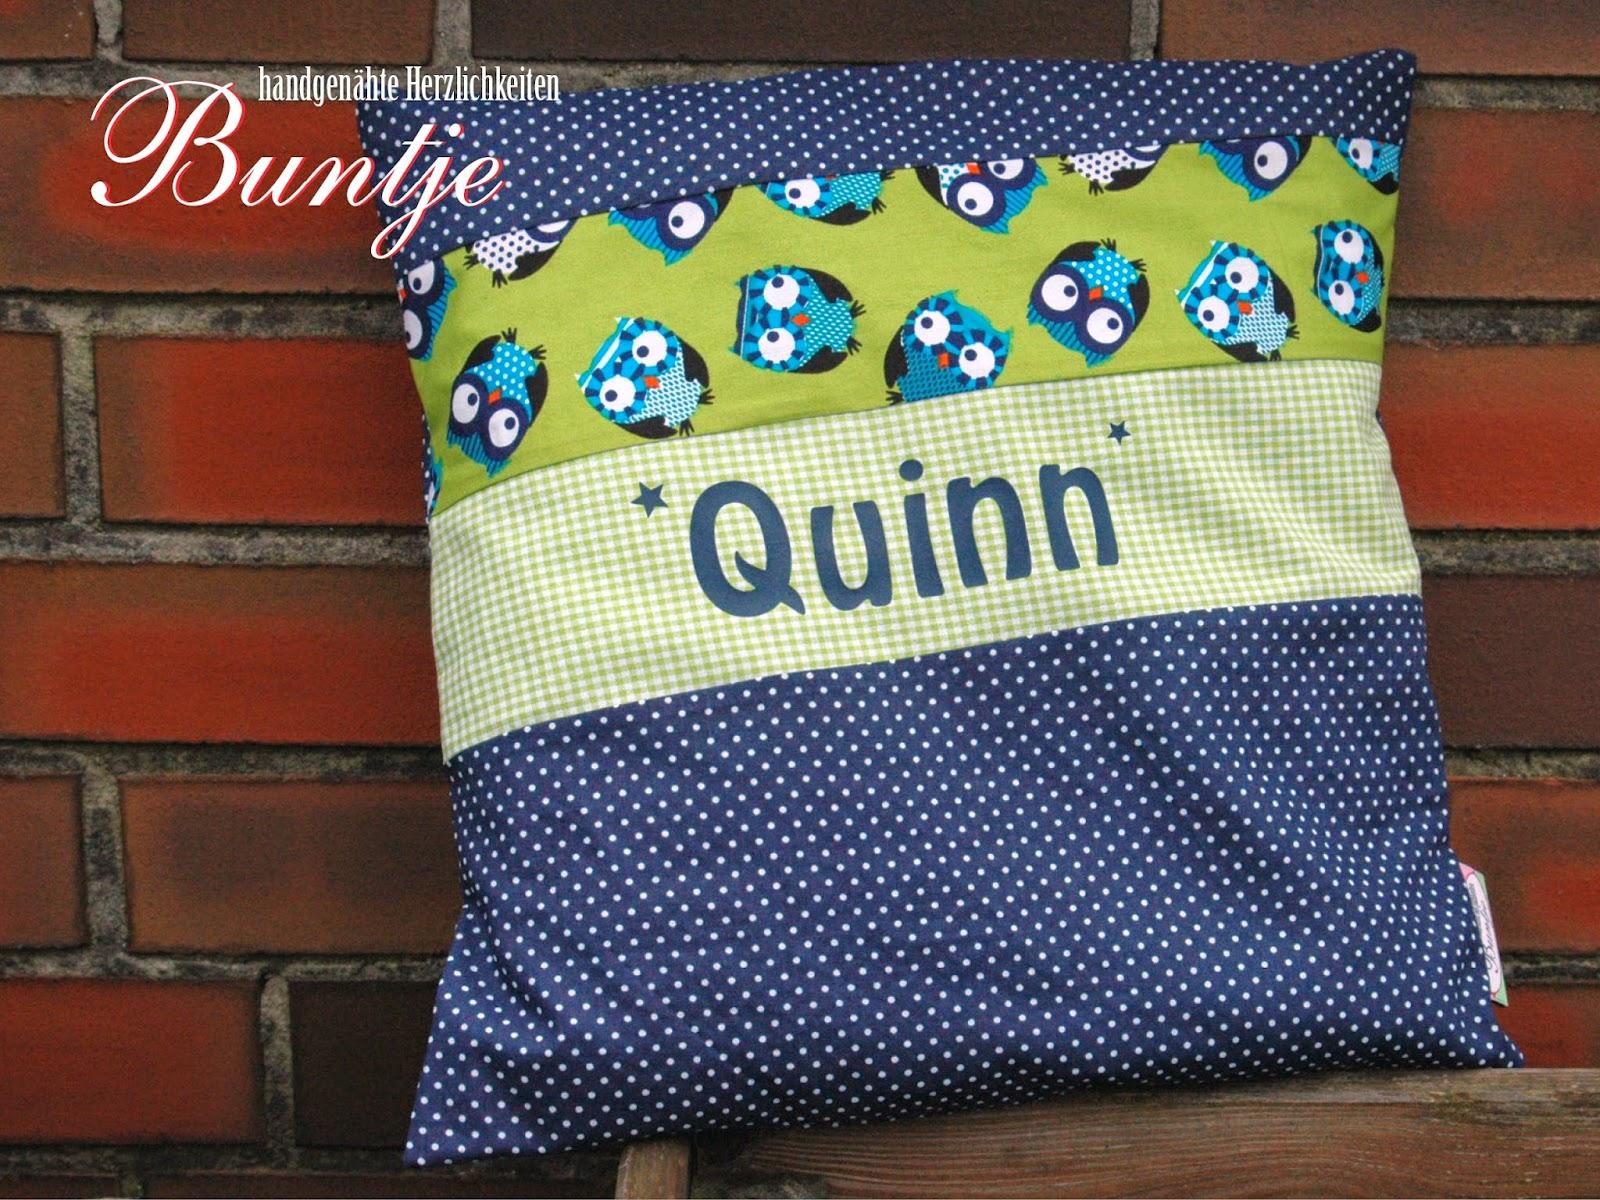 Namenskissen Kissen Name Geschenk Geburt Taufe Geburtstag Junge blau grün Eulen Tiere Quinn Buntje nähen handmade